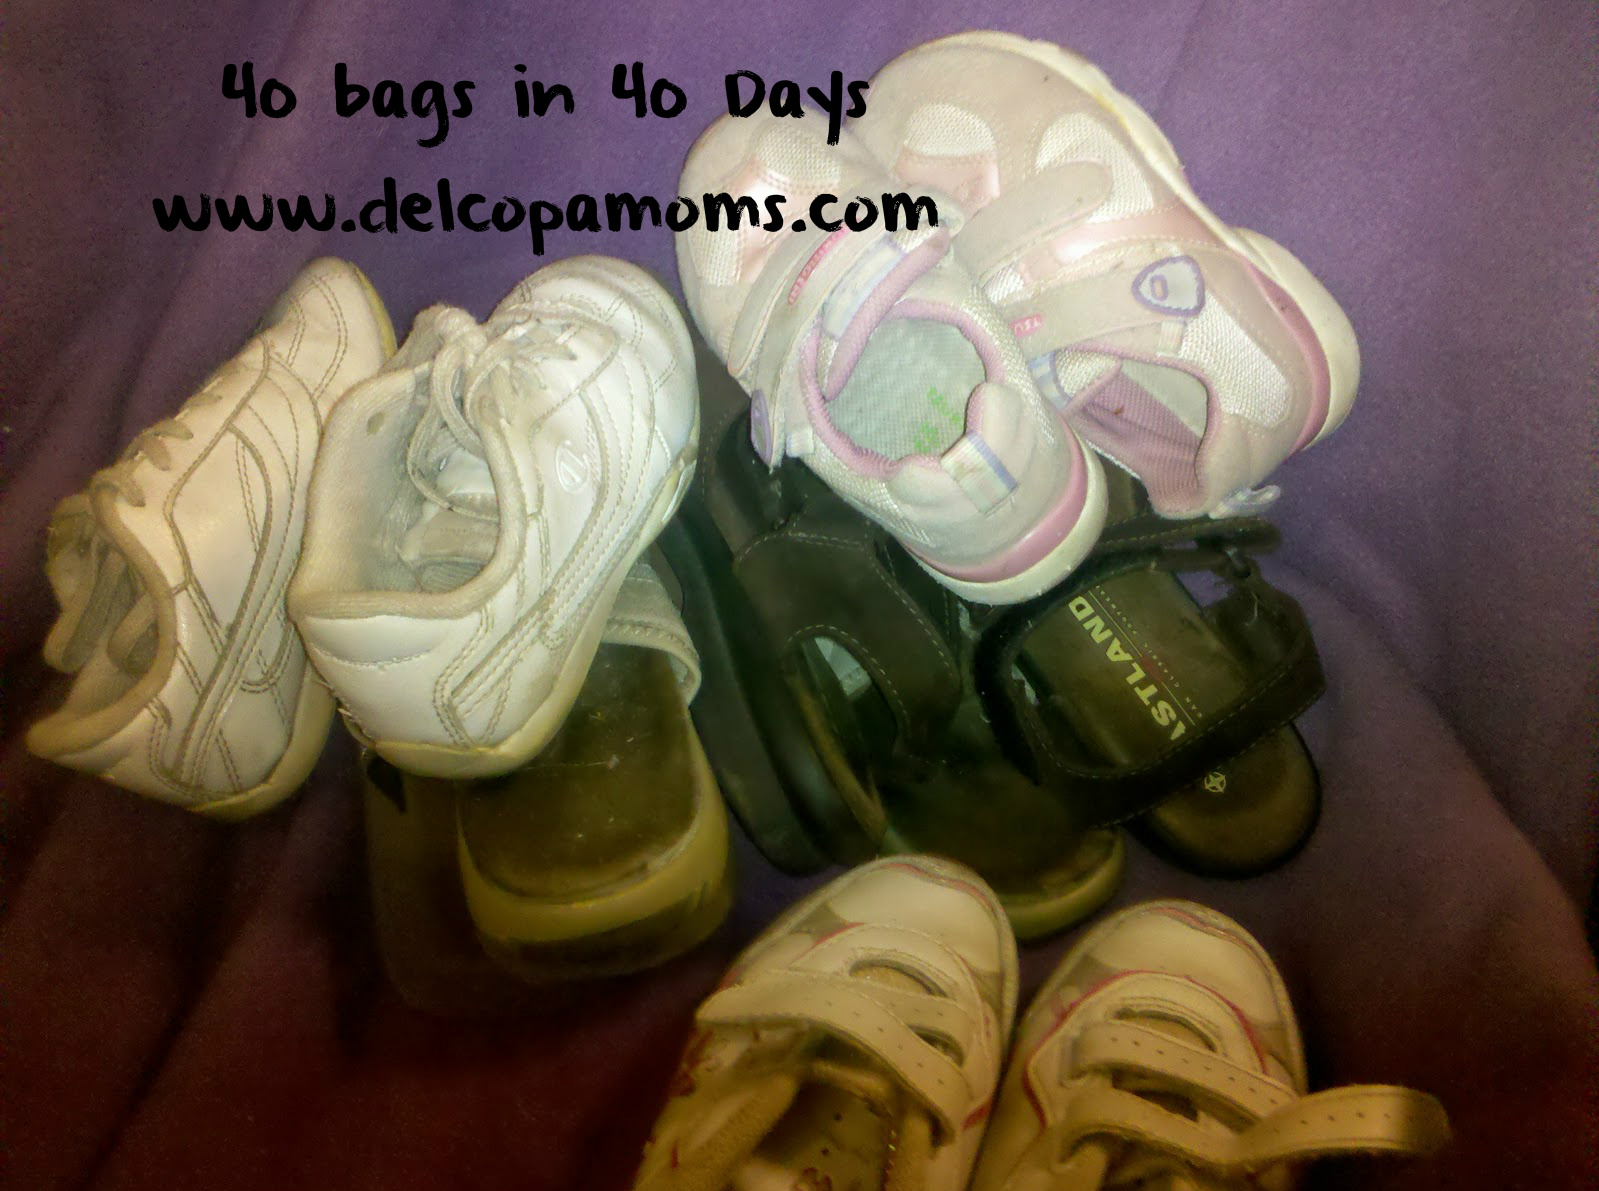 #40bagsin40days